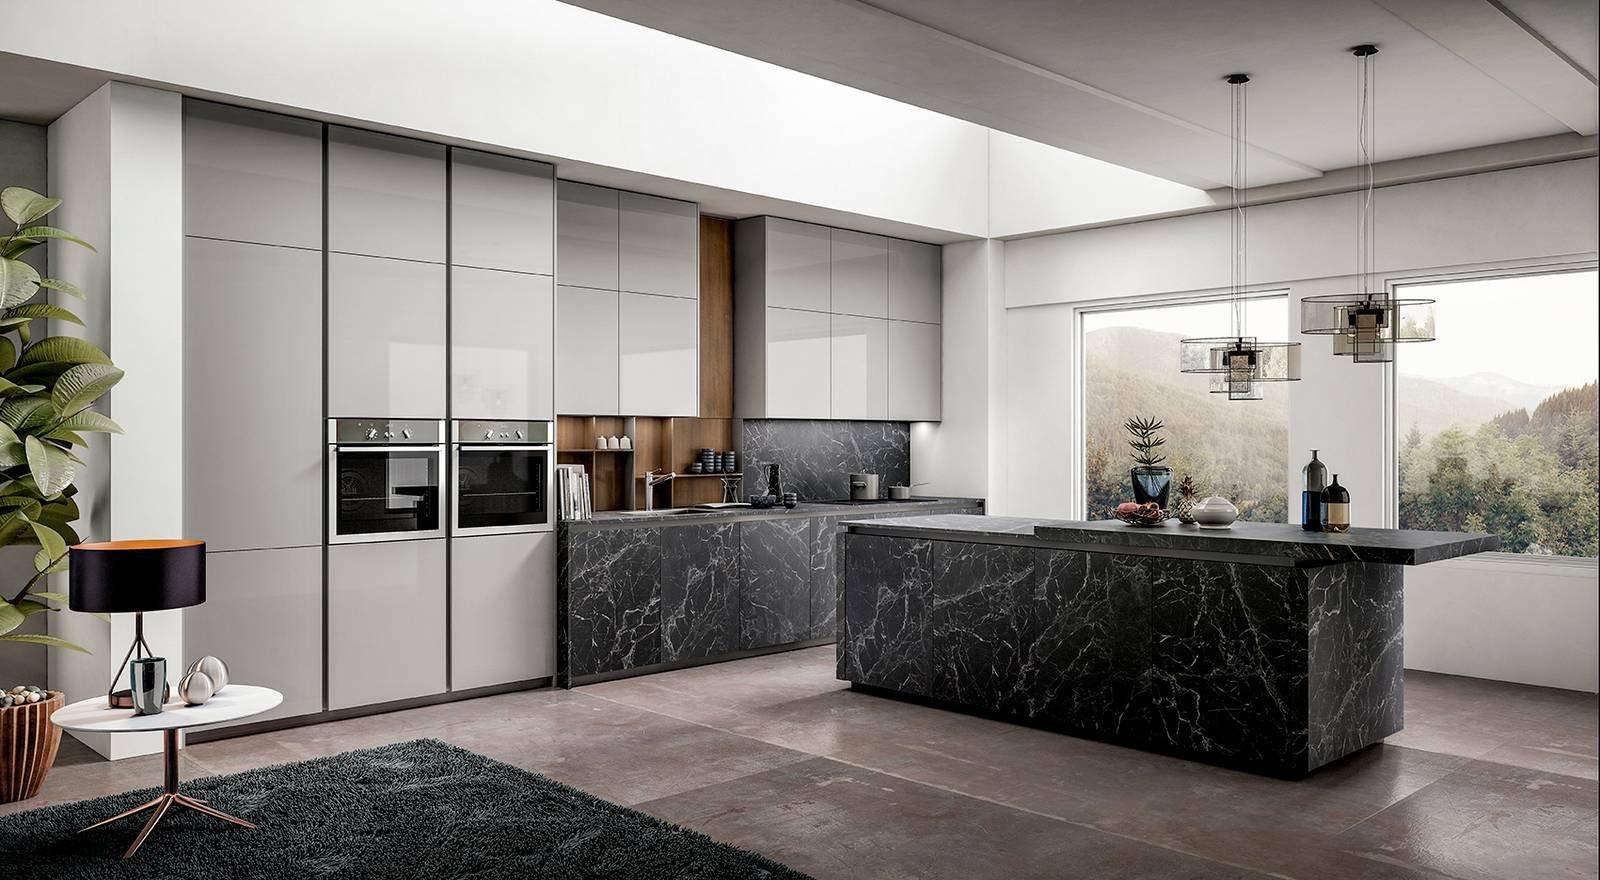 Cucina bianca con top nero arredamento e casalinghi in